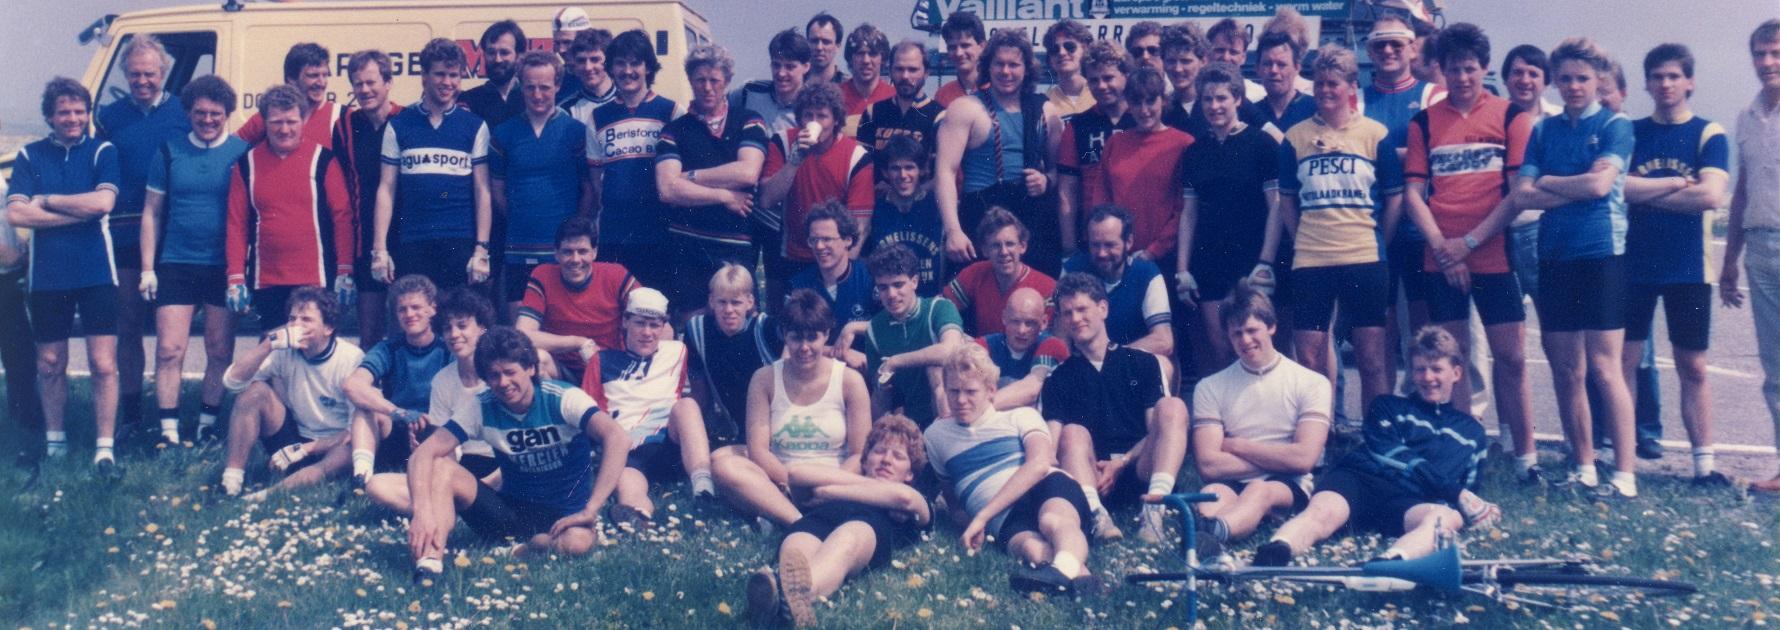 Groepsfoto 1985